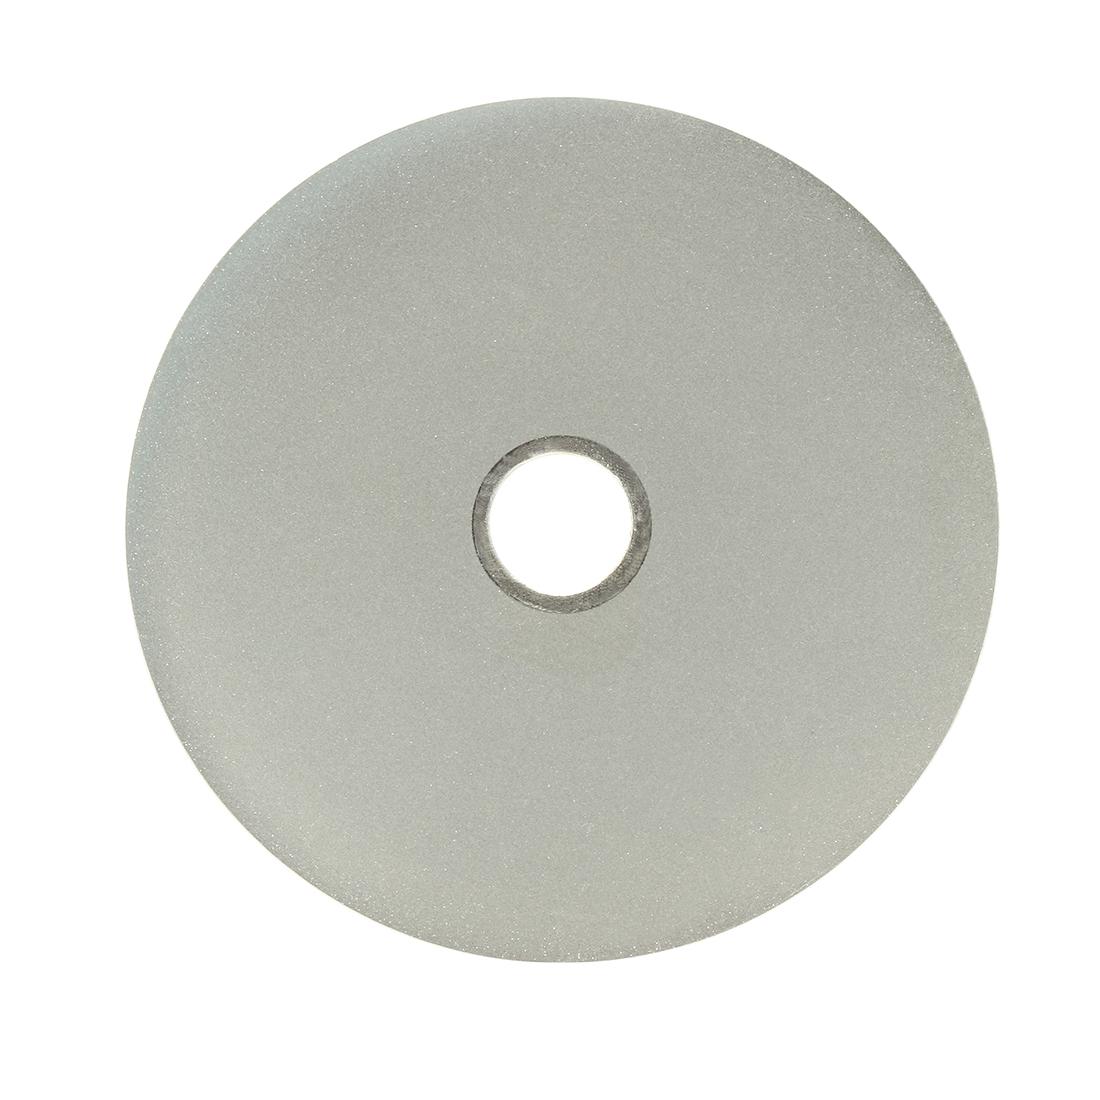 100mm 4-inch Grit 2000 Diamond Coated Flat Lap Disk Wheel Grinding Sanding Disc